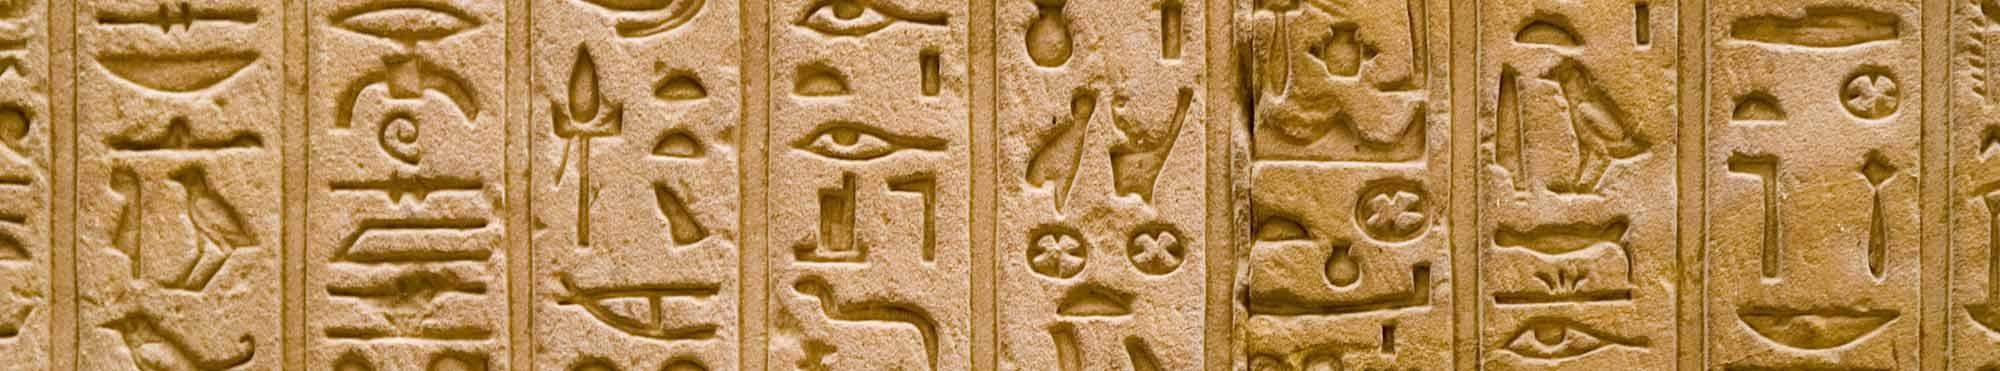 FREE Egyptian Hieroglyph Tattoo Text Translation - TattooTranslate.com